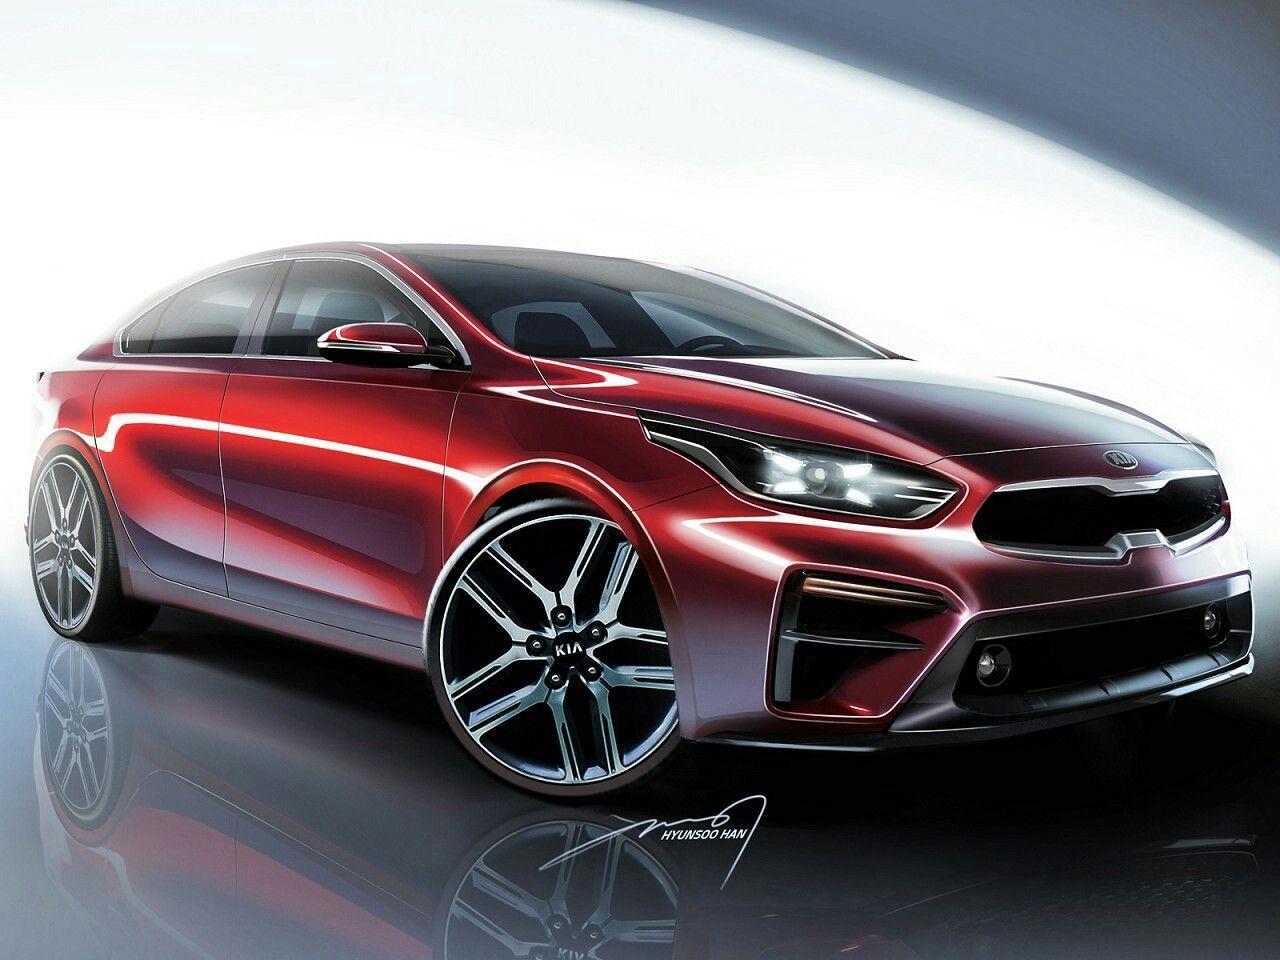 Kia Cerato 2019 concepts design Kia forte, Kia, Car